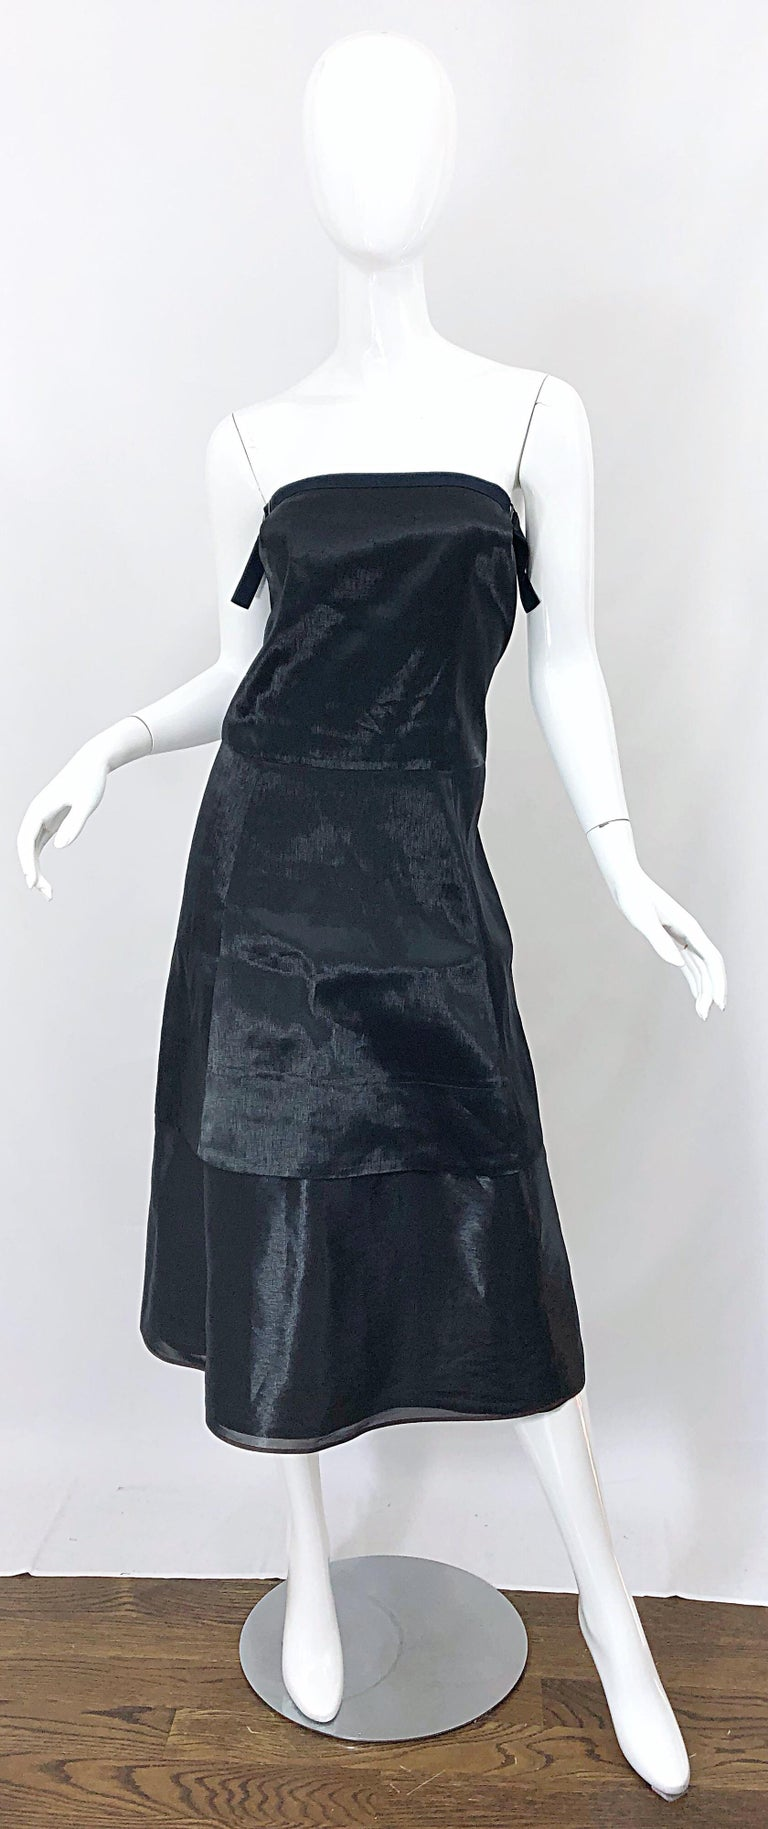 Jil Sander Size 8 Vintage Black Metallic Avant Garde Strapless 1990s Dress 90s For Sale 10